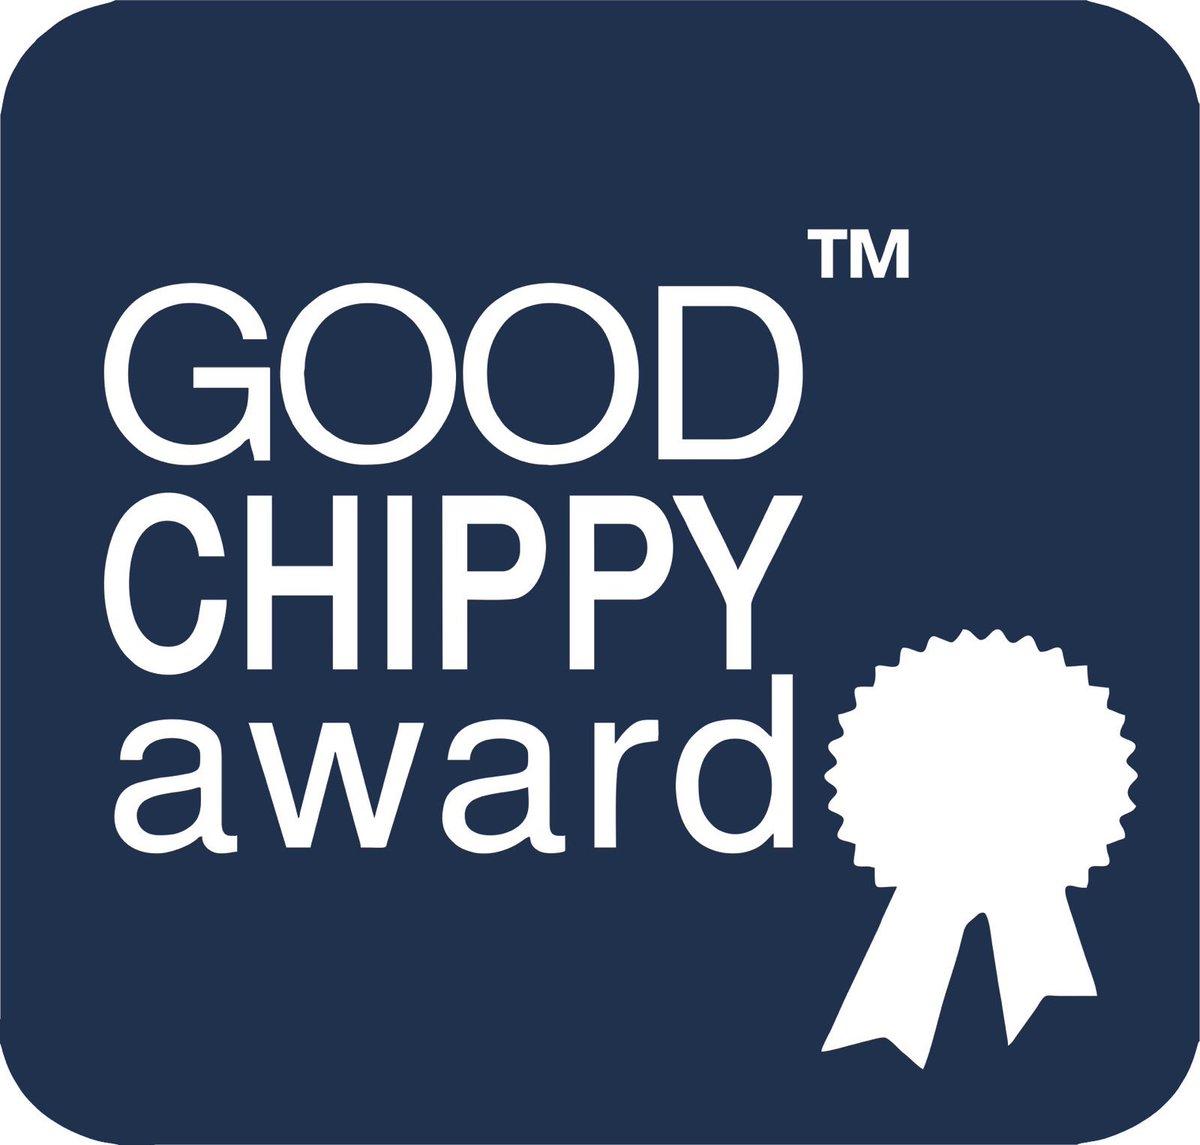 The good chippy award.jpg